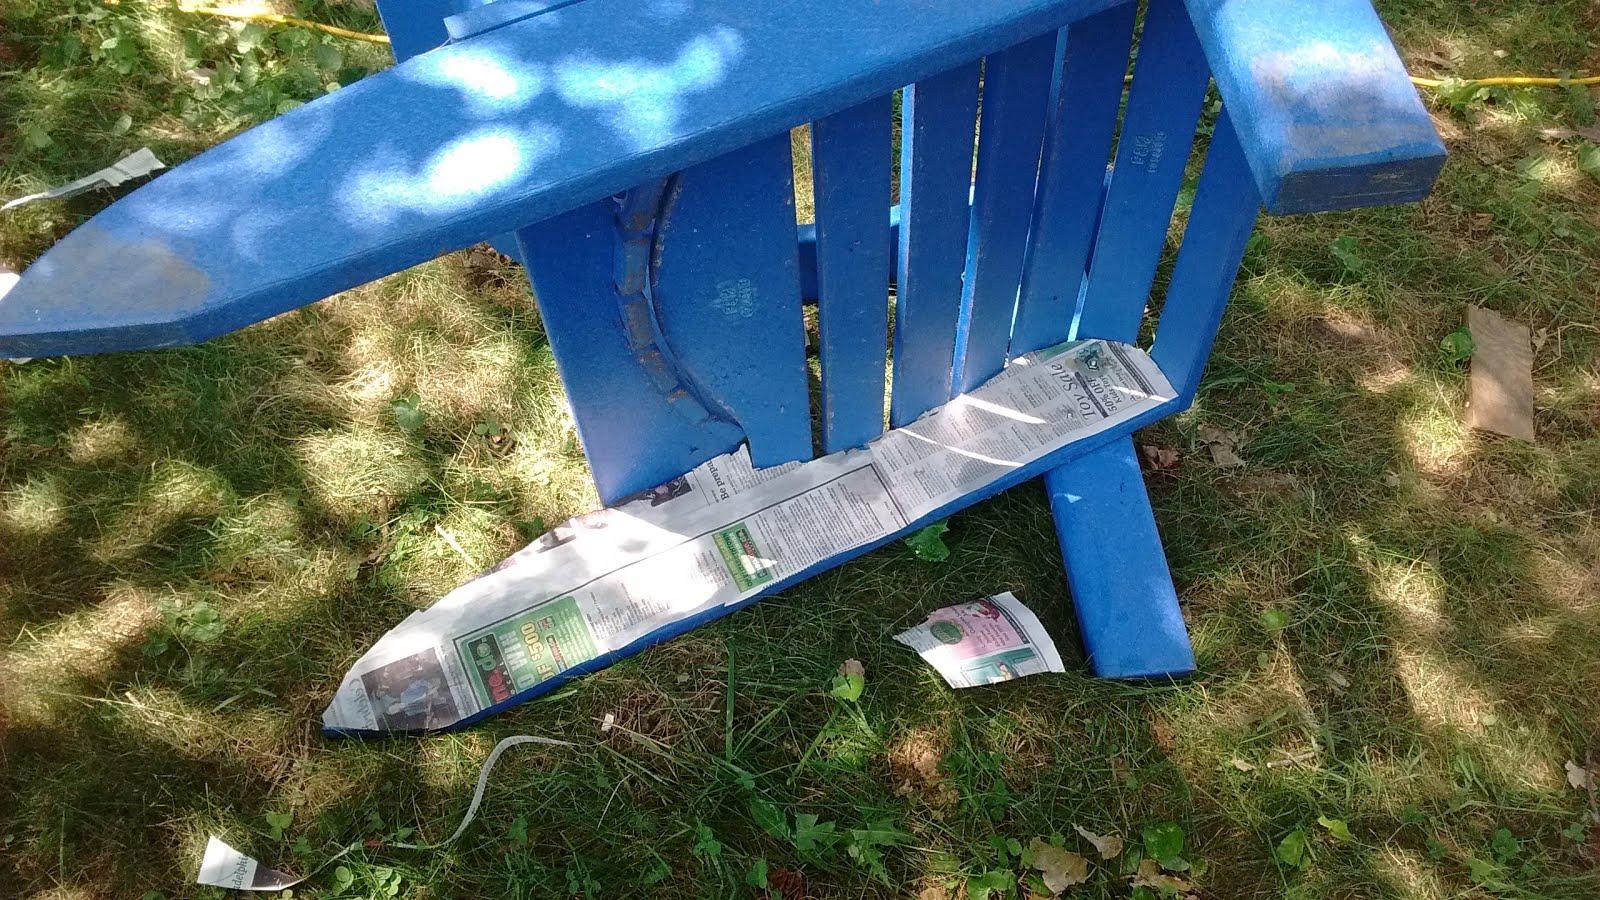 Adirondack chair back slats - Steps 35 38 Involve Measuring The Front Legs The Chair Slats The Back Slats